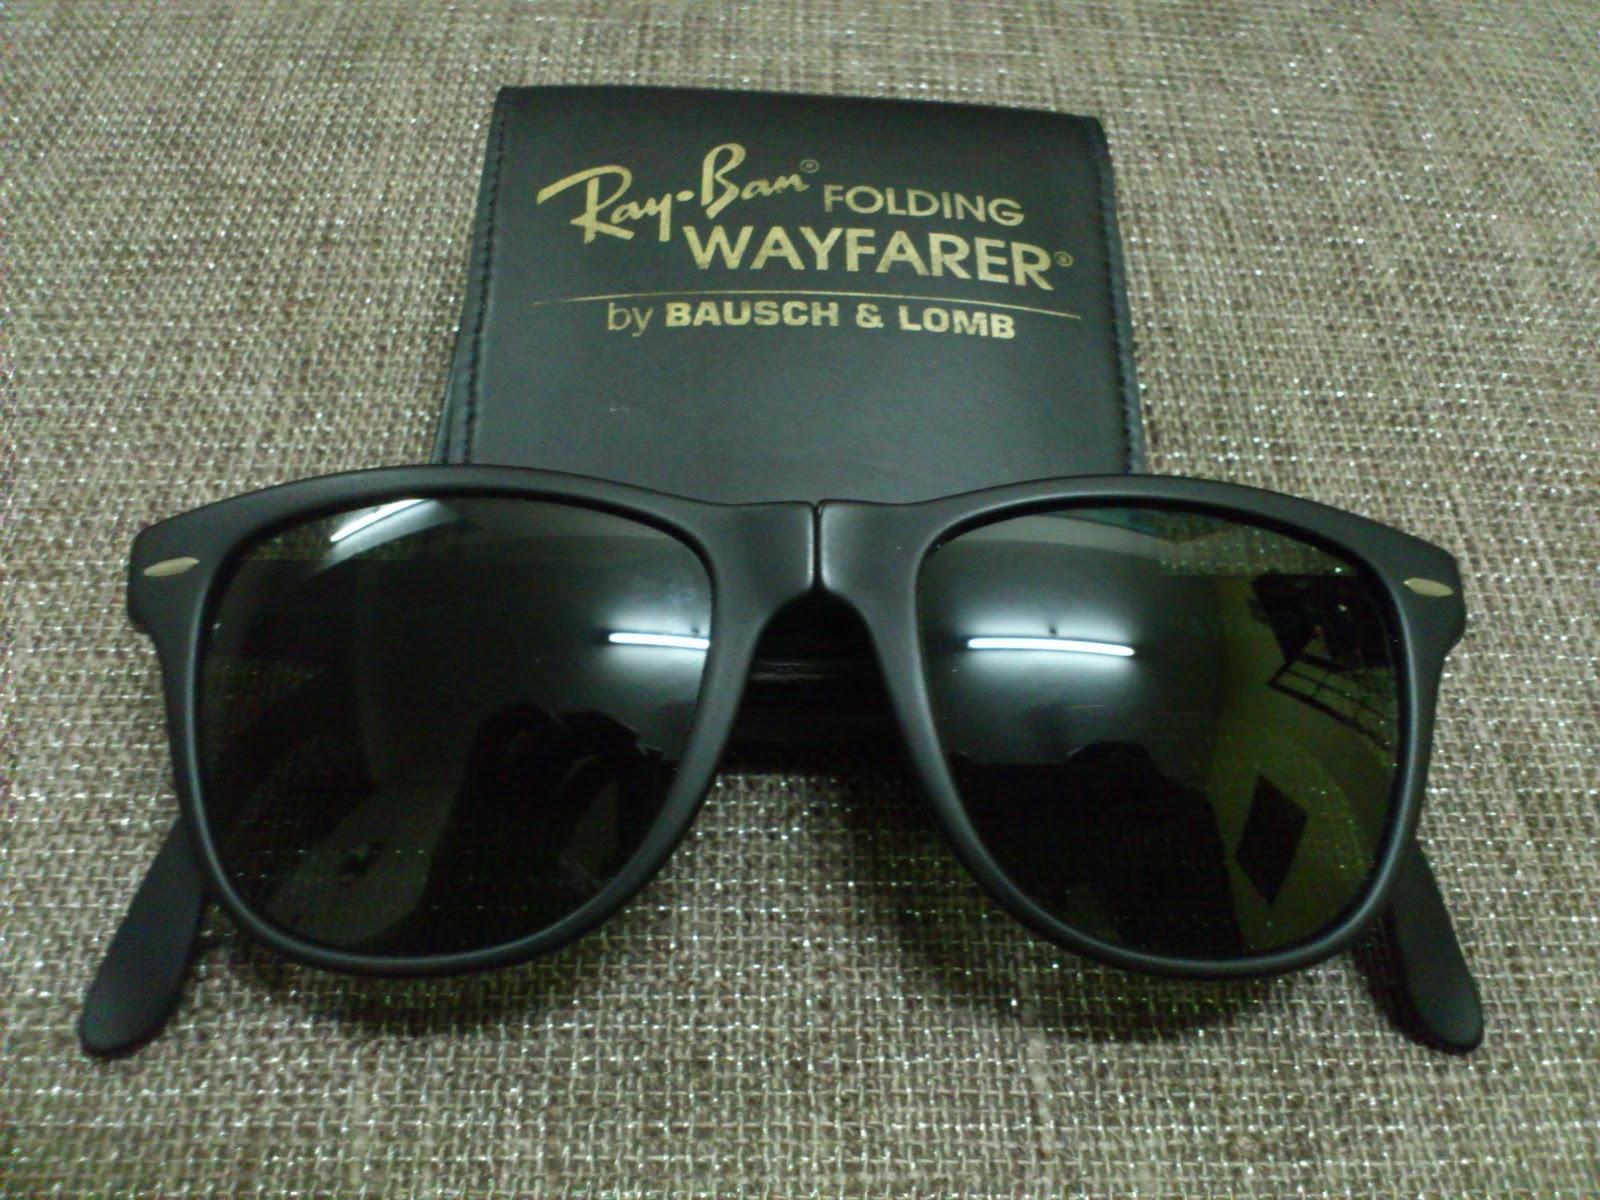 3b4c371ef6 Vintage Bausch   Lomb Rayban Sunglasses  (SOLD)Ray Ban Folding ...